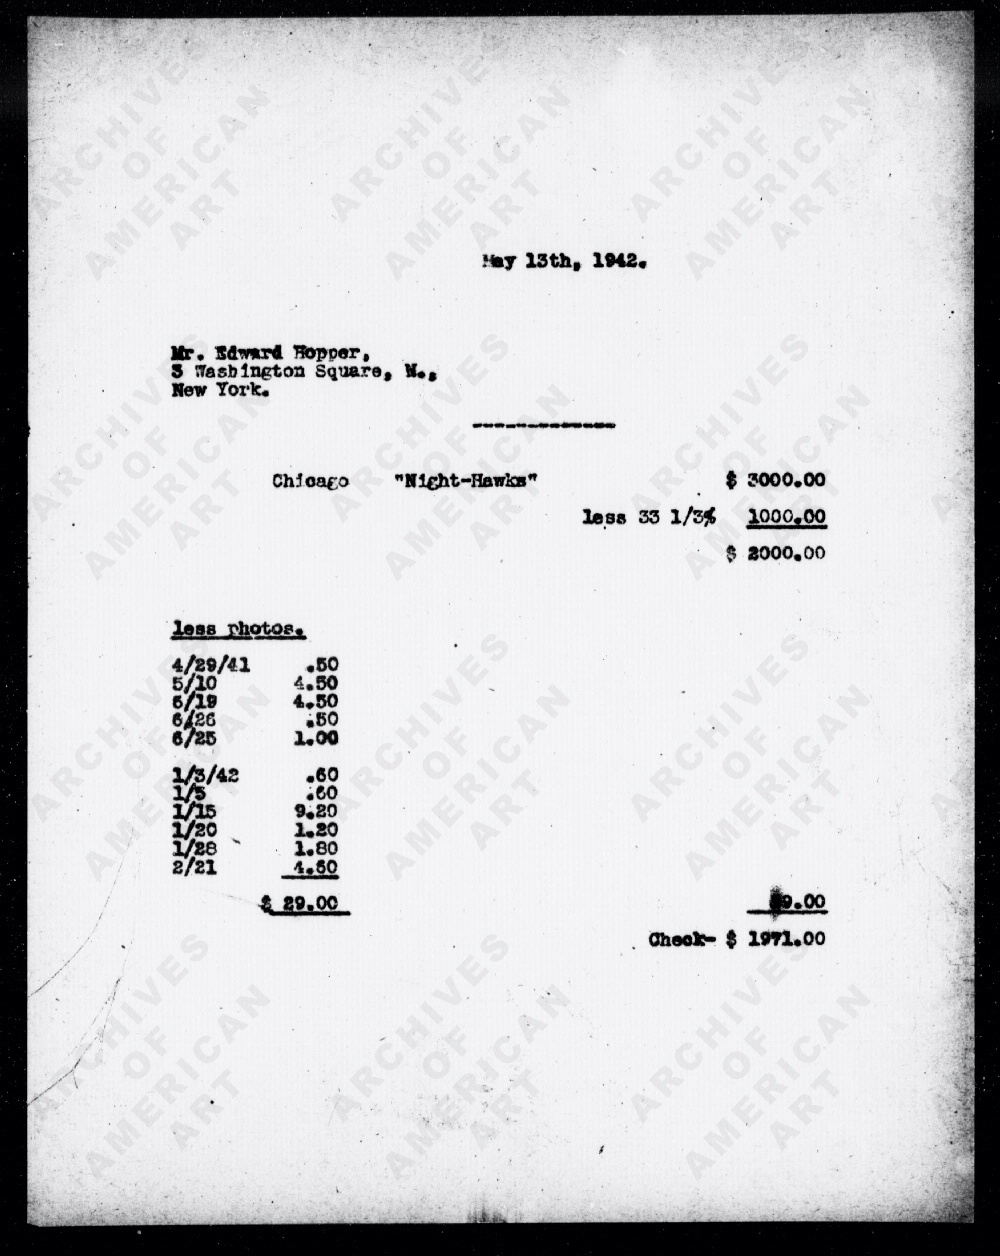 filenighthawks invoice ed hopper 1942 wikimedia commons type of invoice